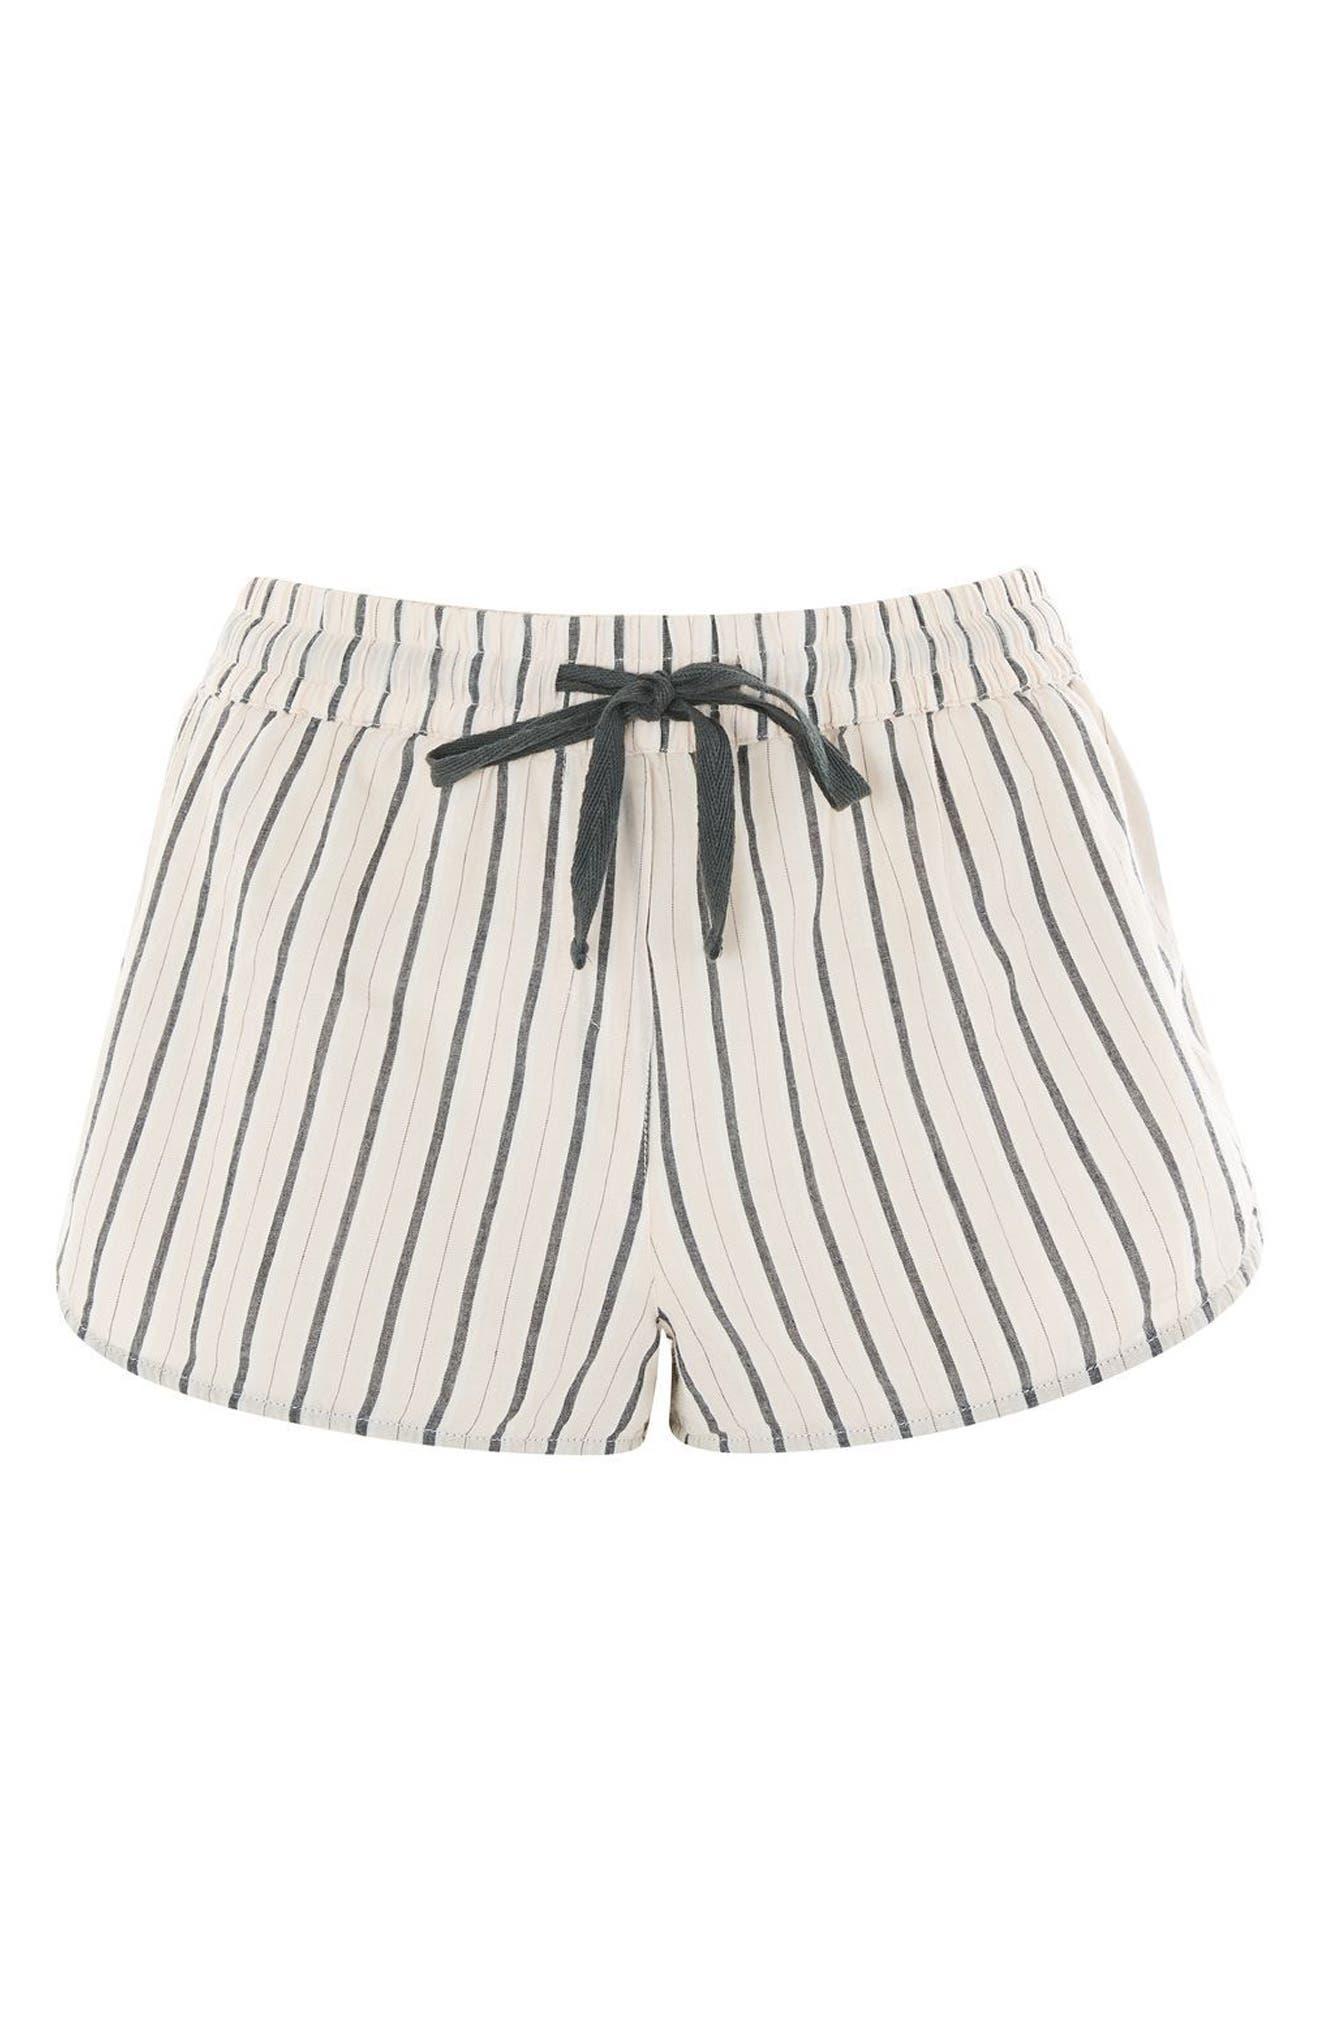 Alternate Image 1 Selected - Topshop Stripe Pajama Shorts